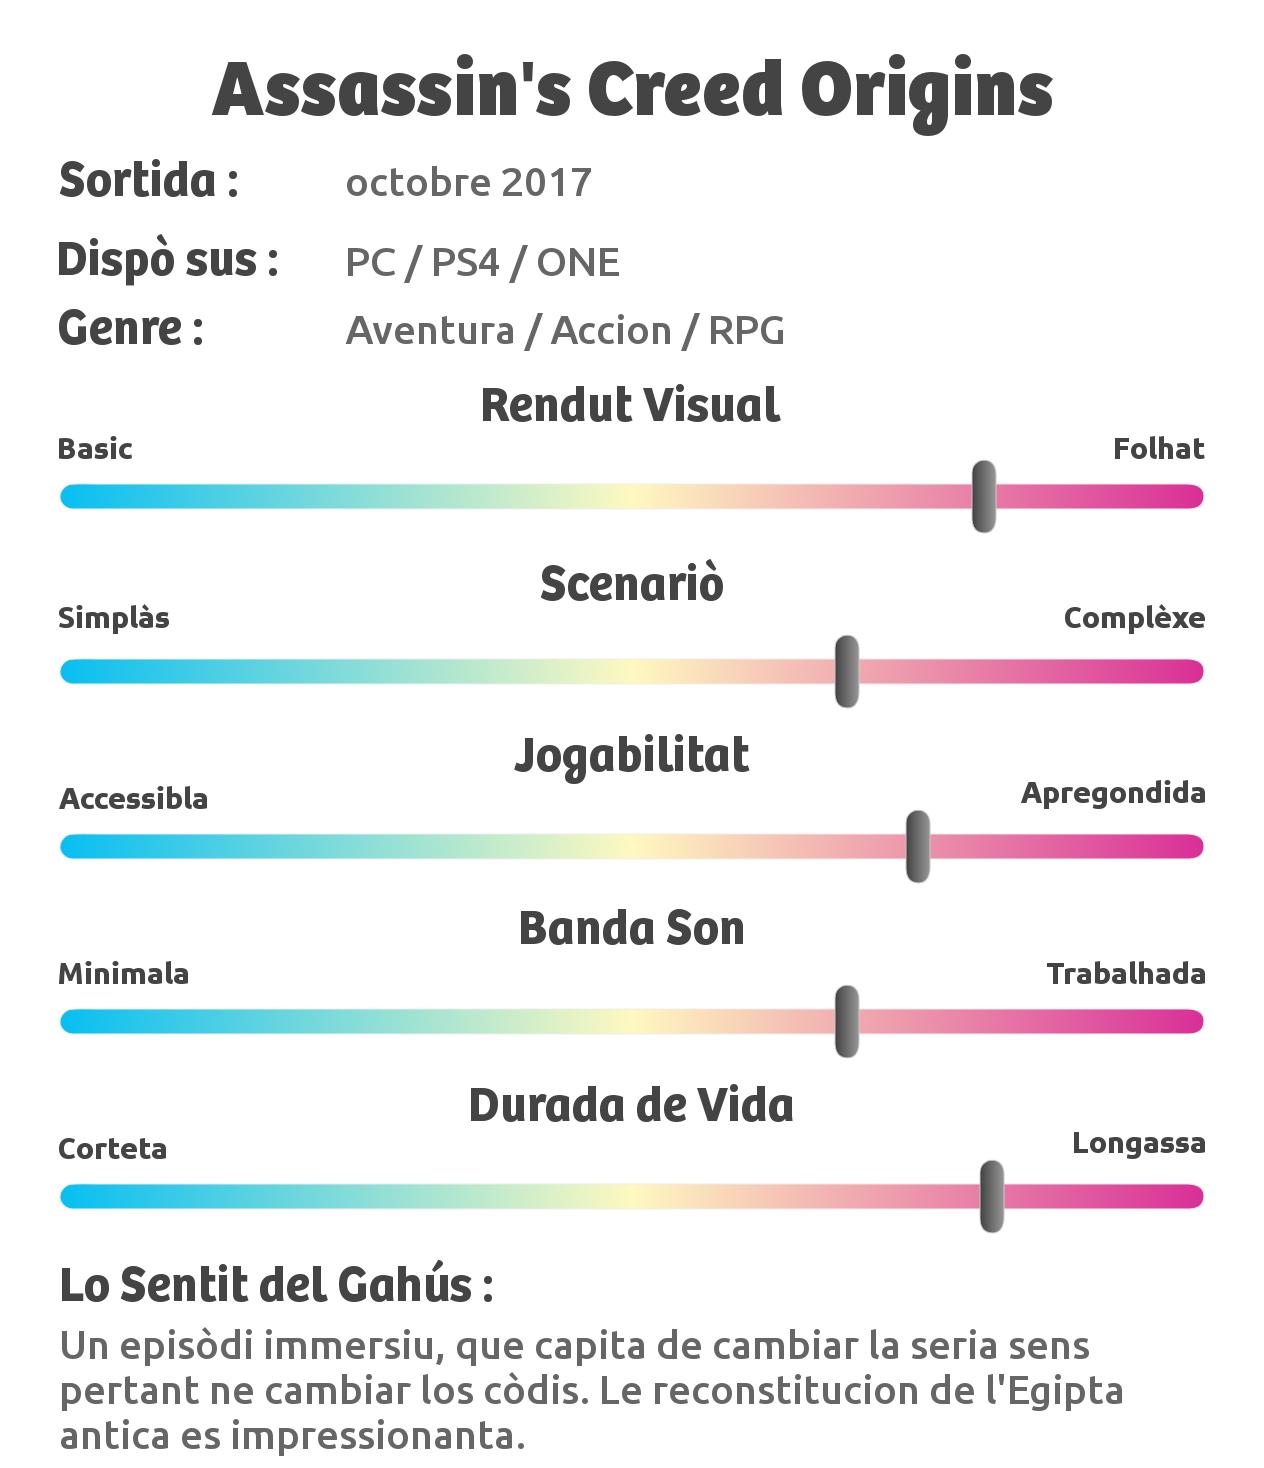 Evaluacion Assassin's Creed Origins